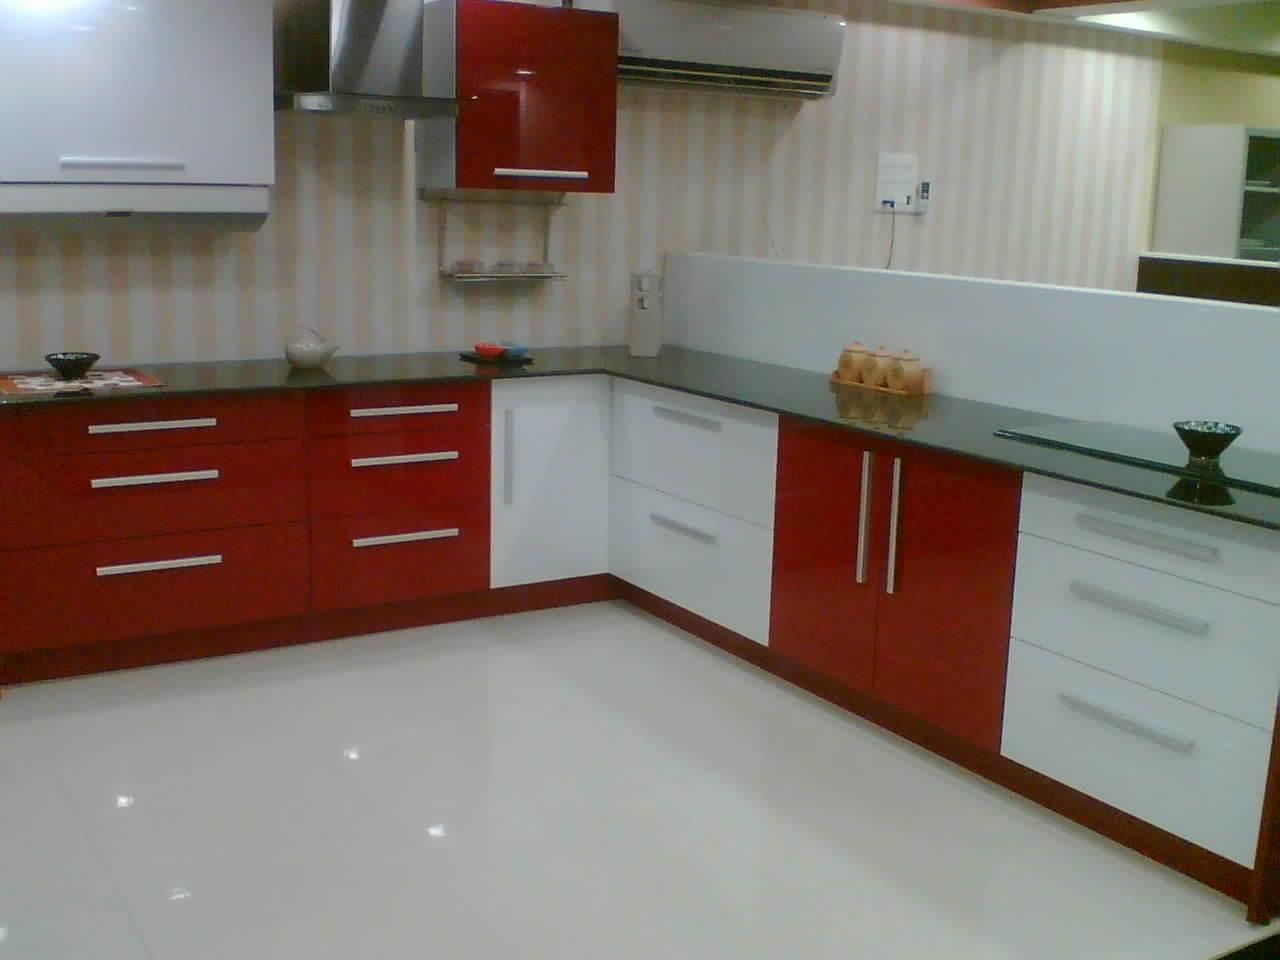 modular kitchen cabinets kitchen cabinets for modular k. VOOJSPX